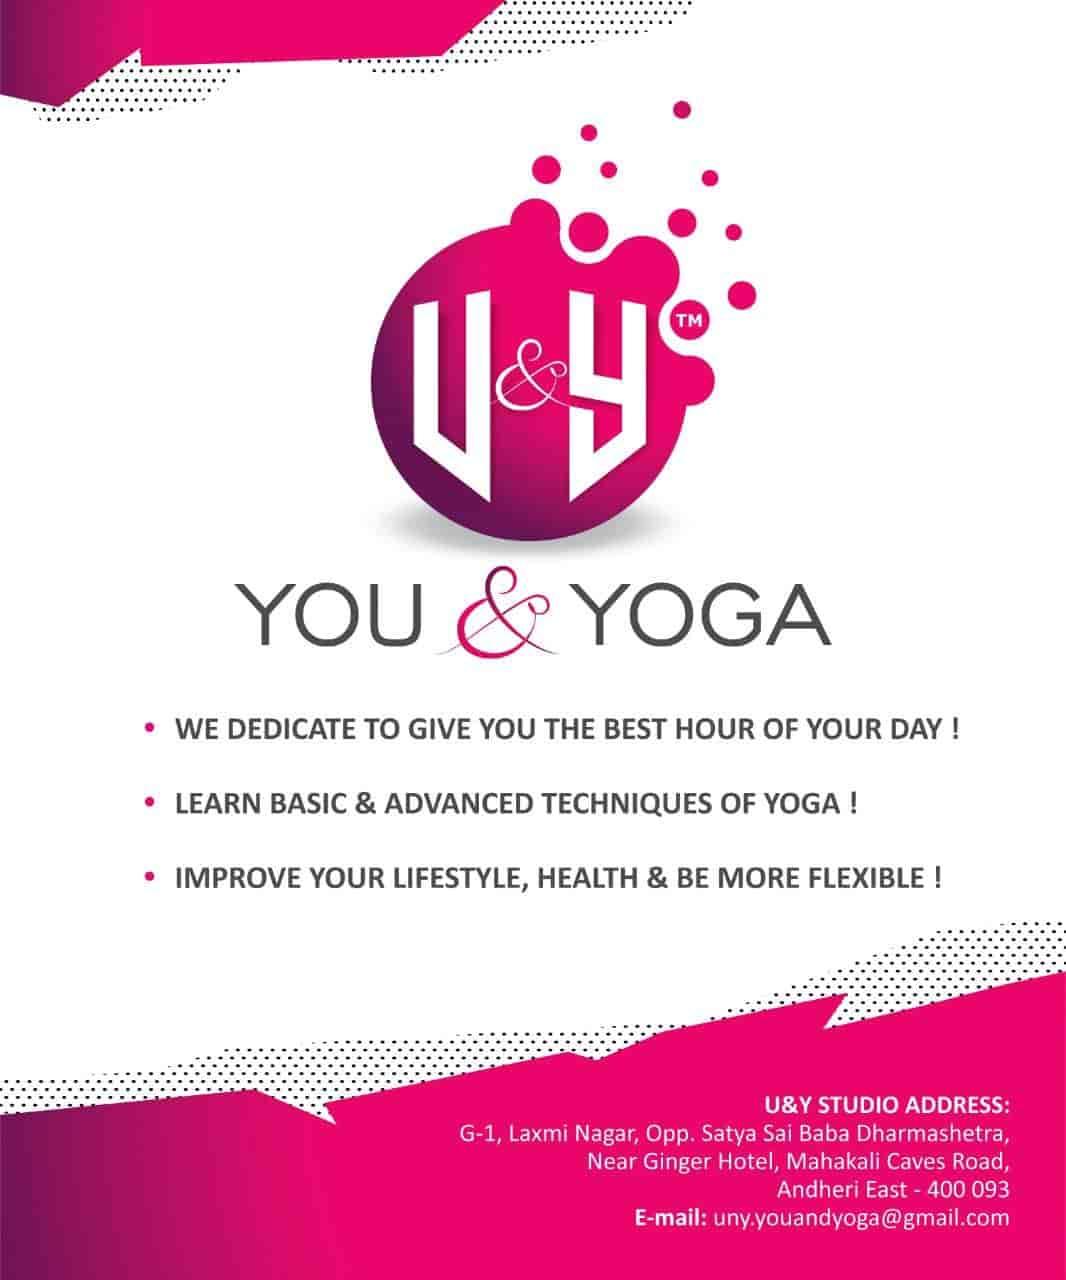 U & Y You and Yoga, Mahakali-andheri East - Yoga Classes in